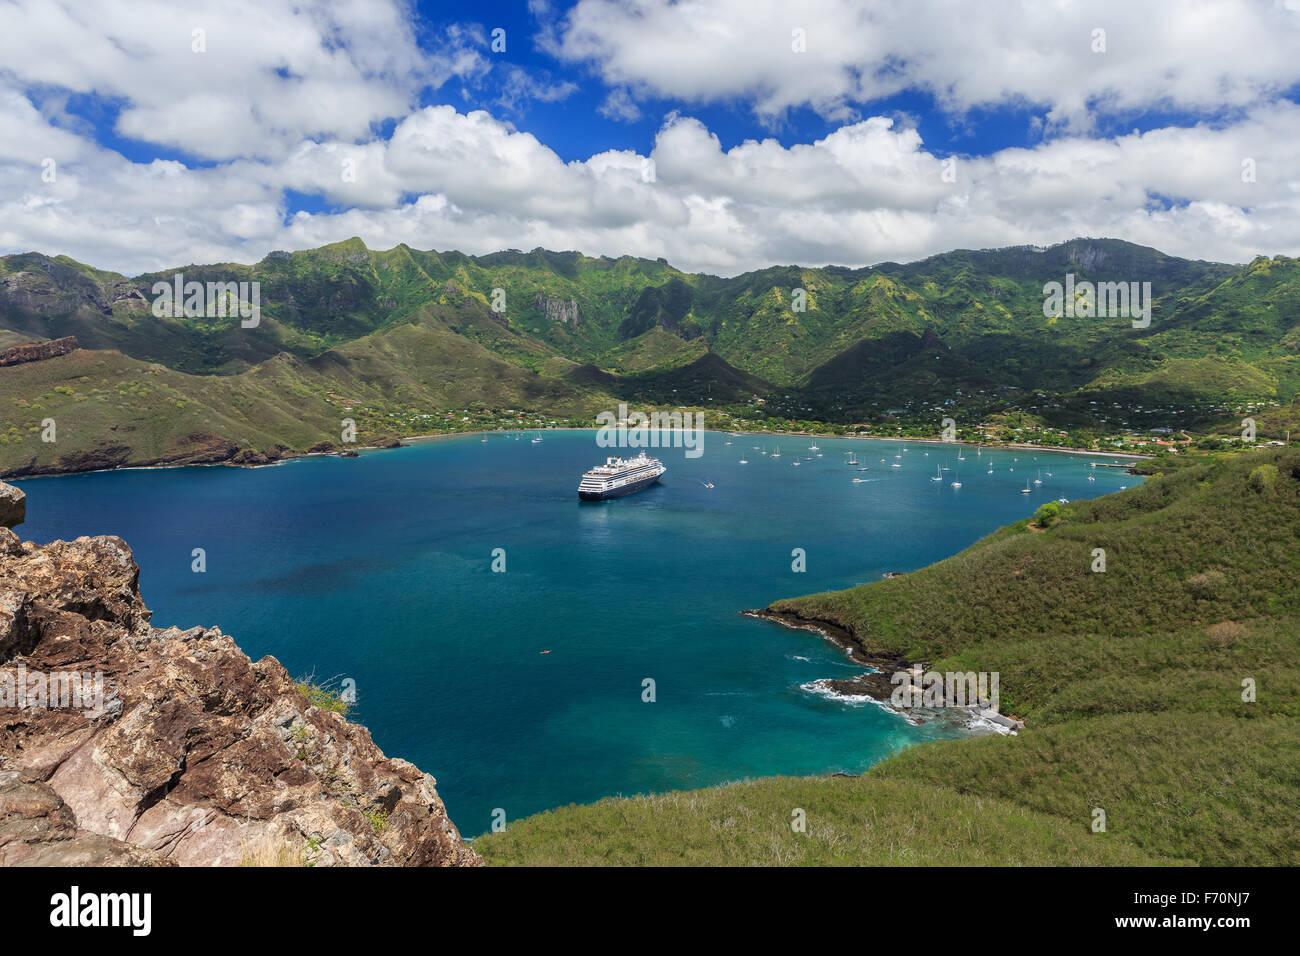 Bay of Taiohae on the island of Nuku Hiva, Marquesas Islands - Stock Image